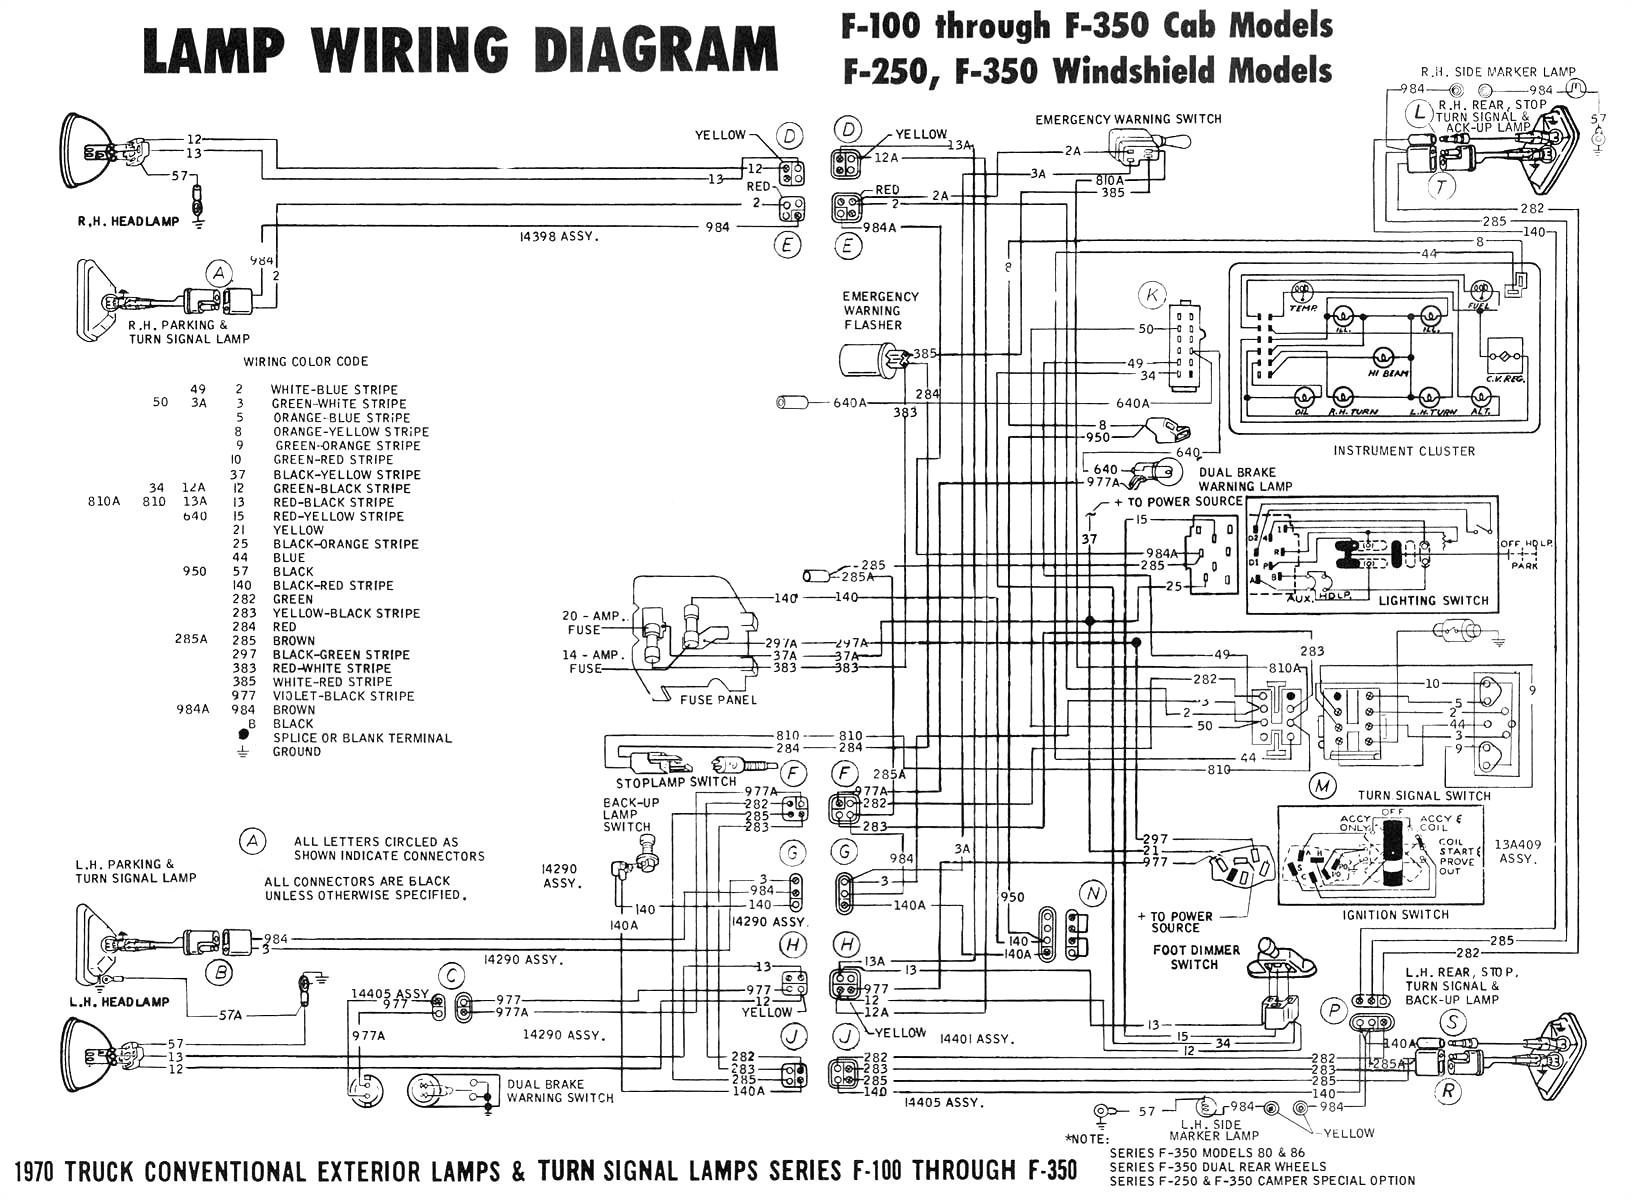 2002 audi a4 quattro wiring diagram new 99 audi wiring diagram schema wiring diagram of 2002 audi a4 quattro wiring diagram jpg